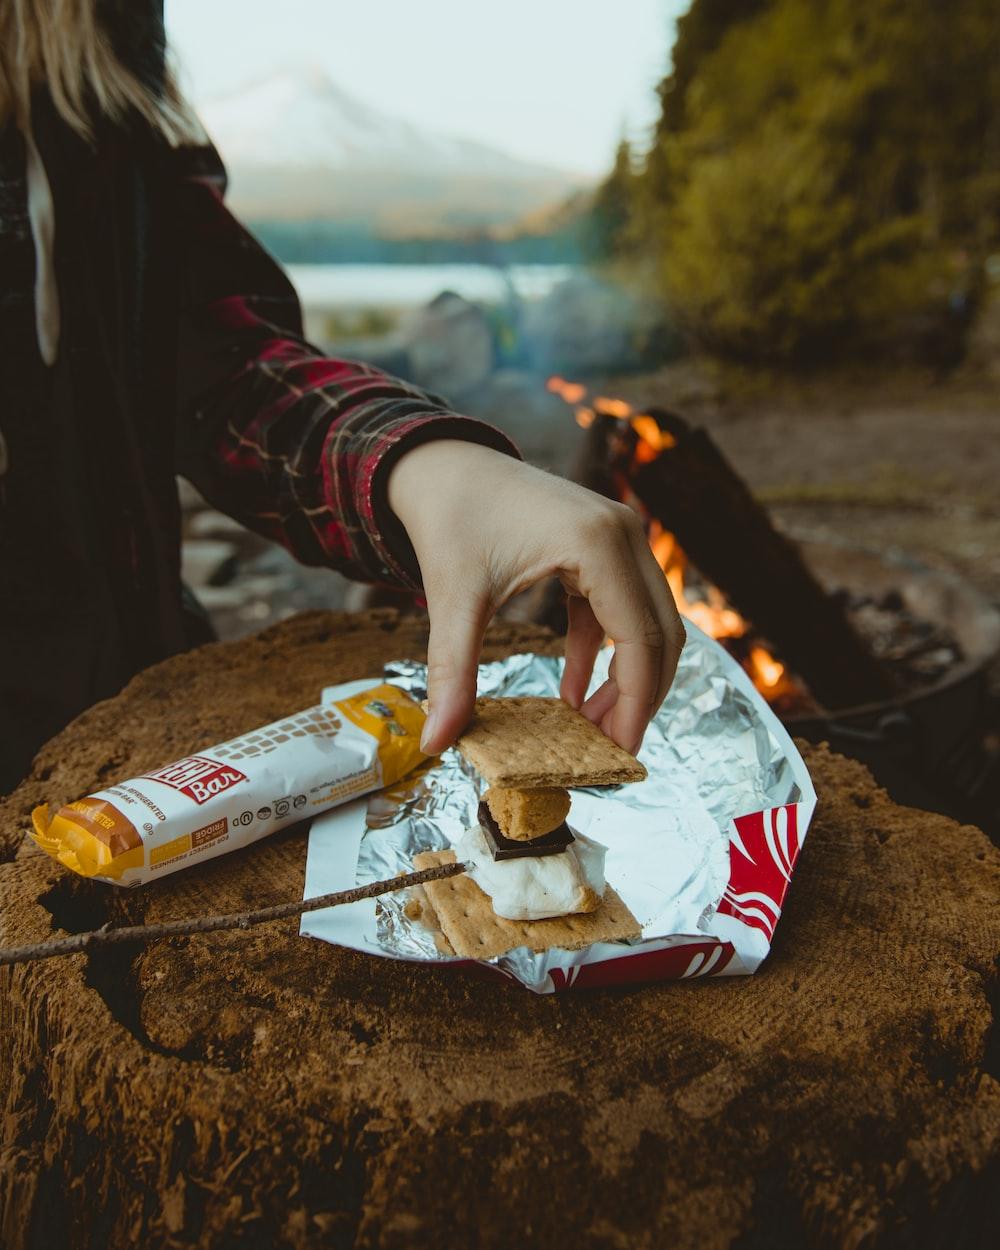 person making a biscuit sandwich near bonfire